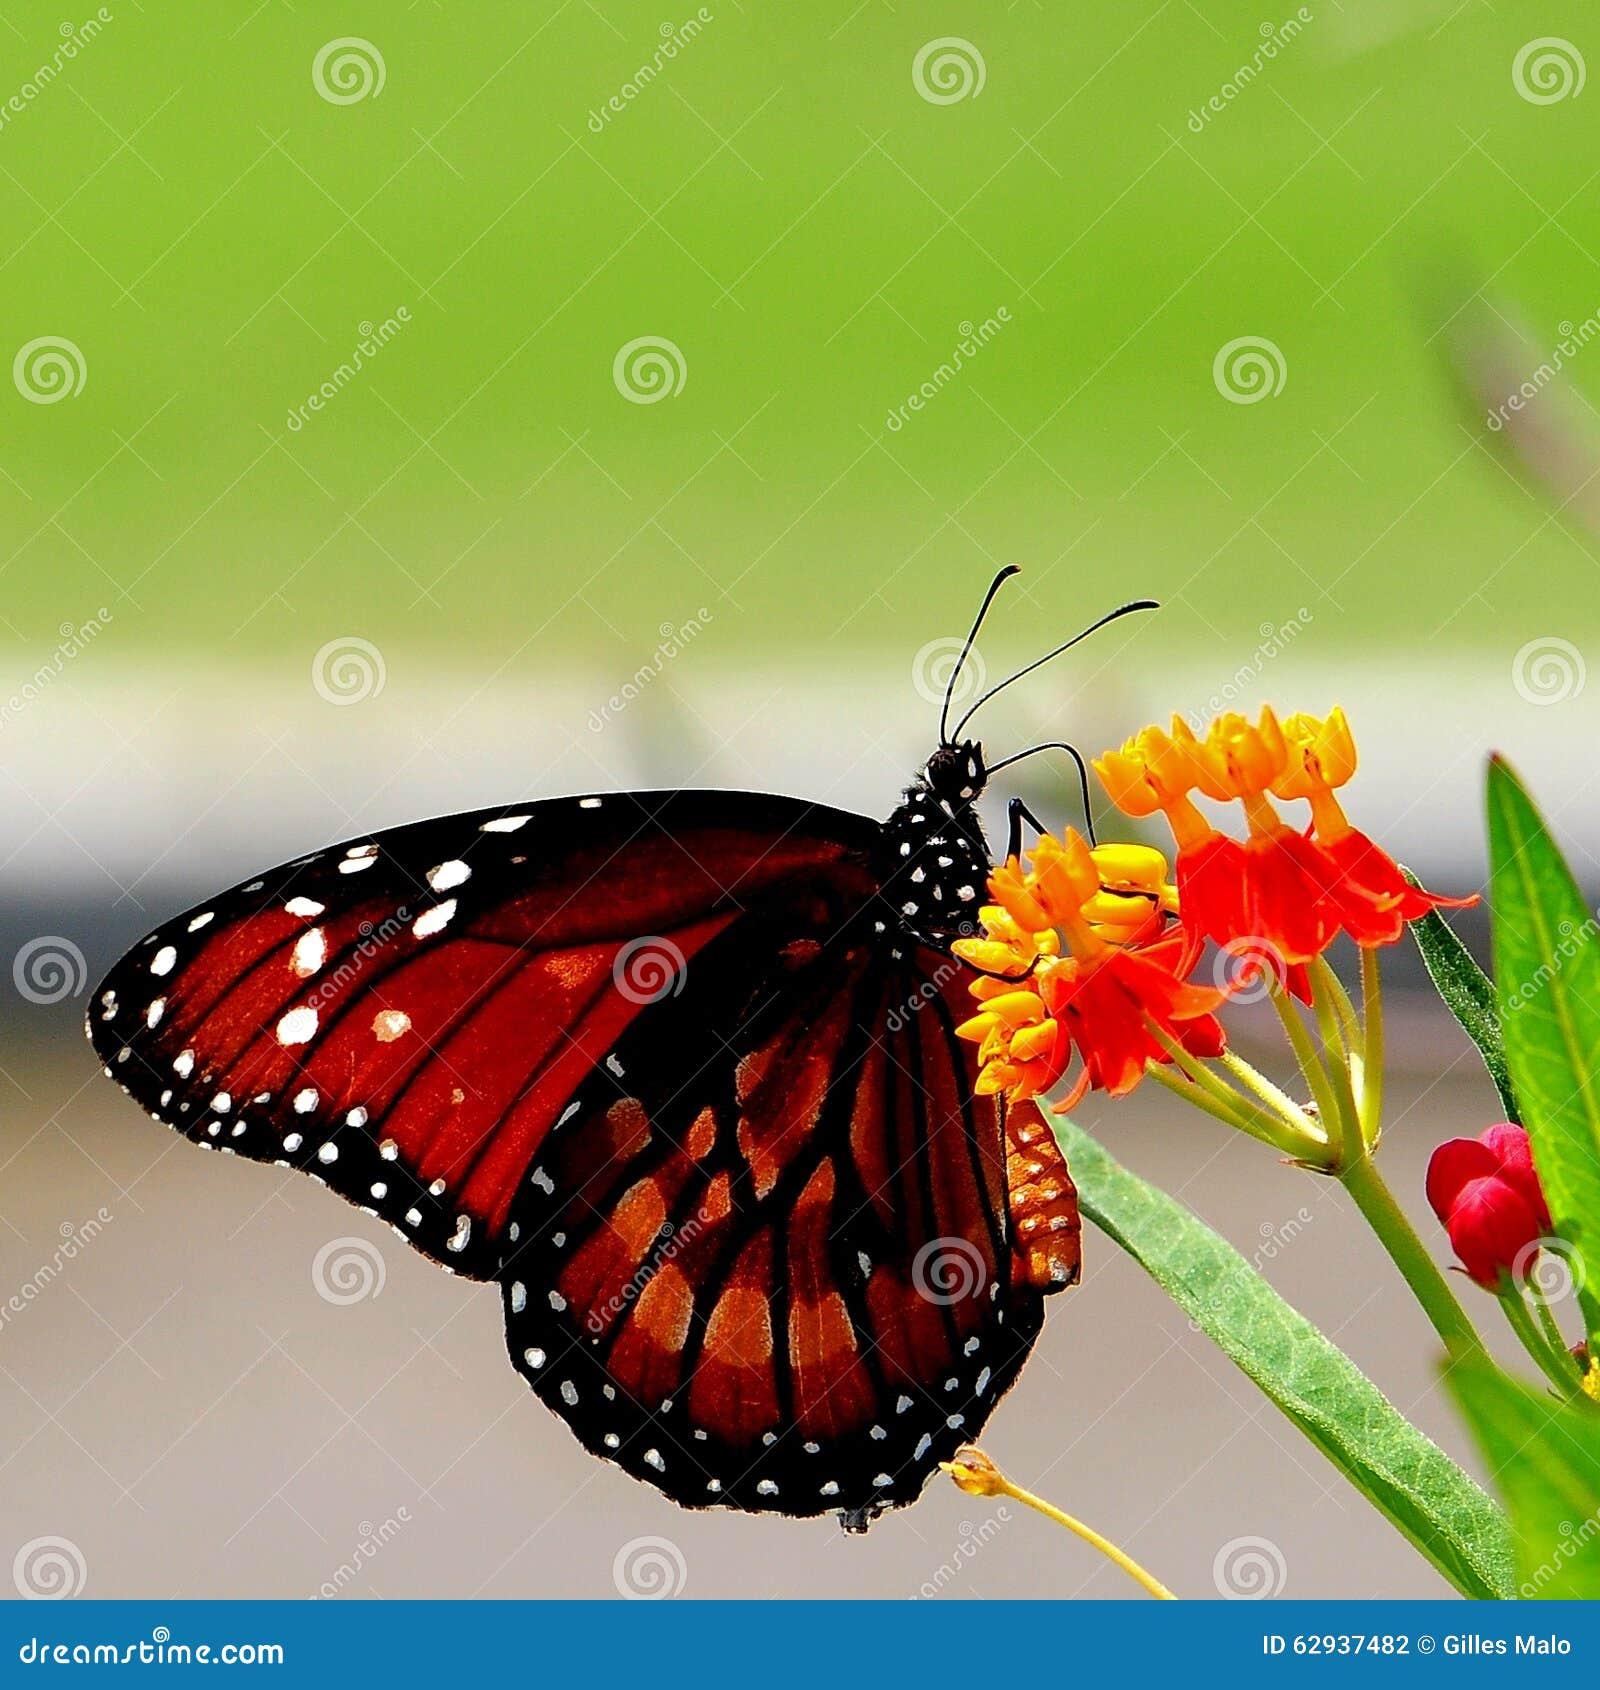 Butterfly on scarlet milkweed flowers